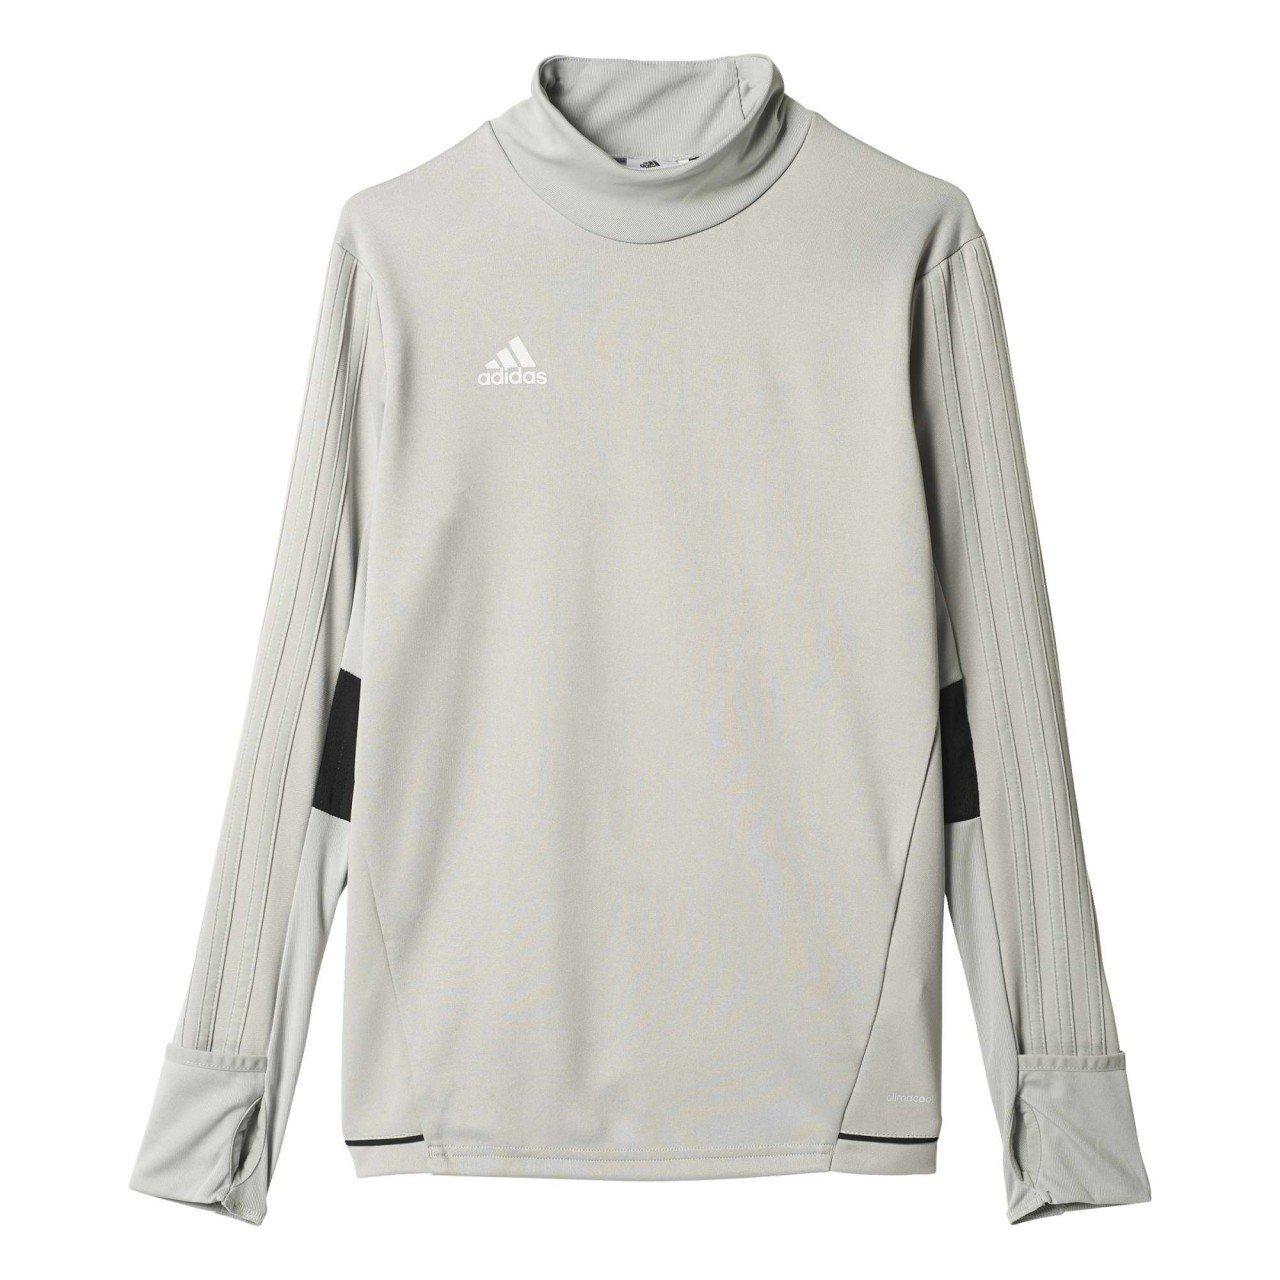 adidas Kinder Tiro 17 Training Sweatshirt